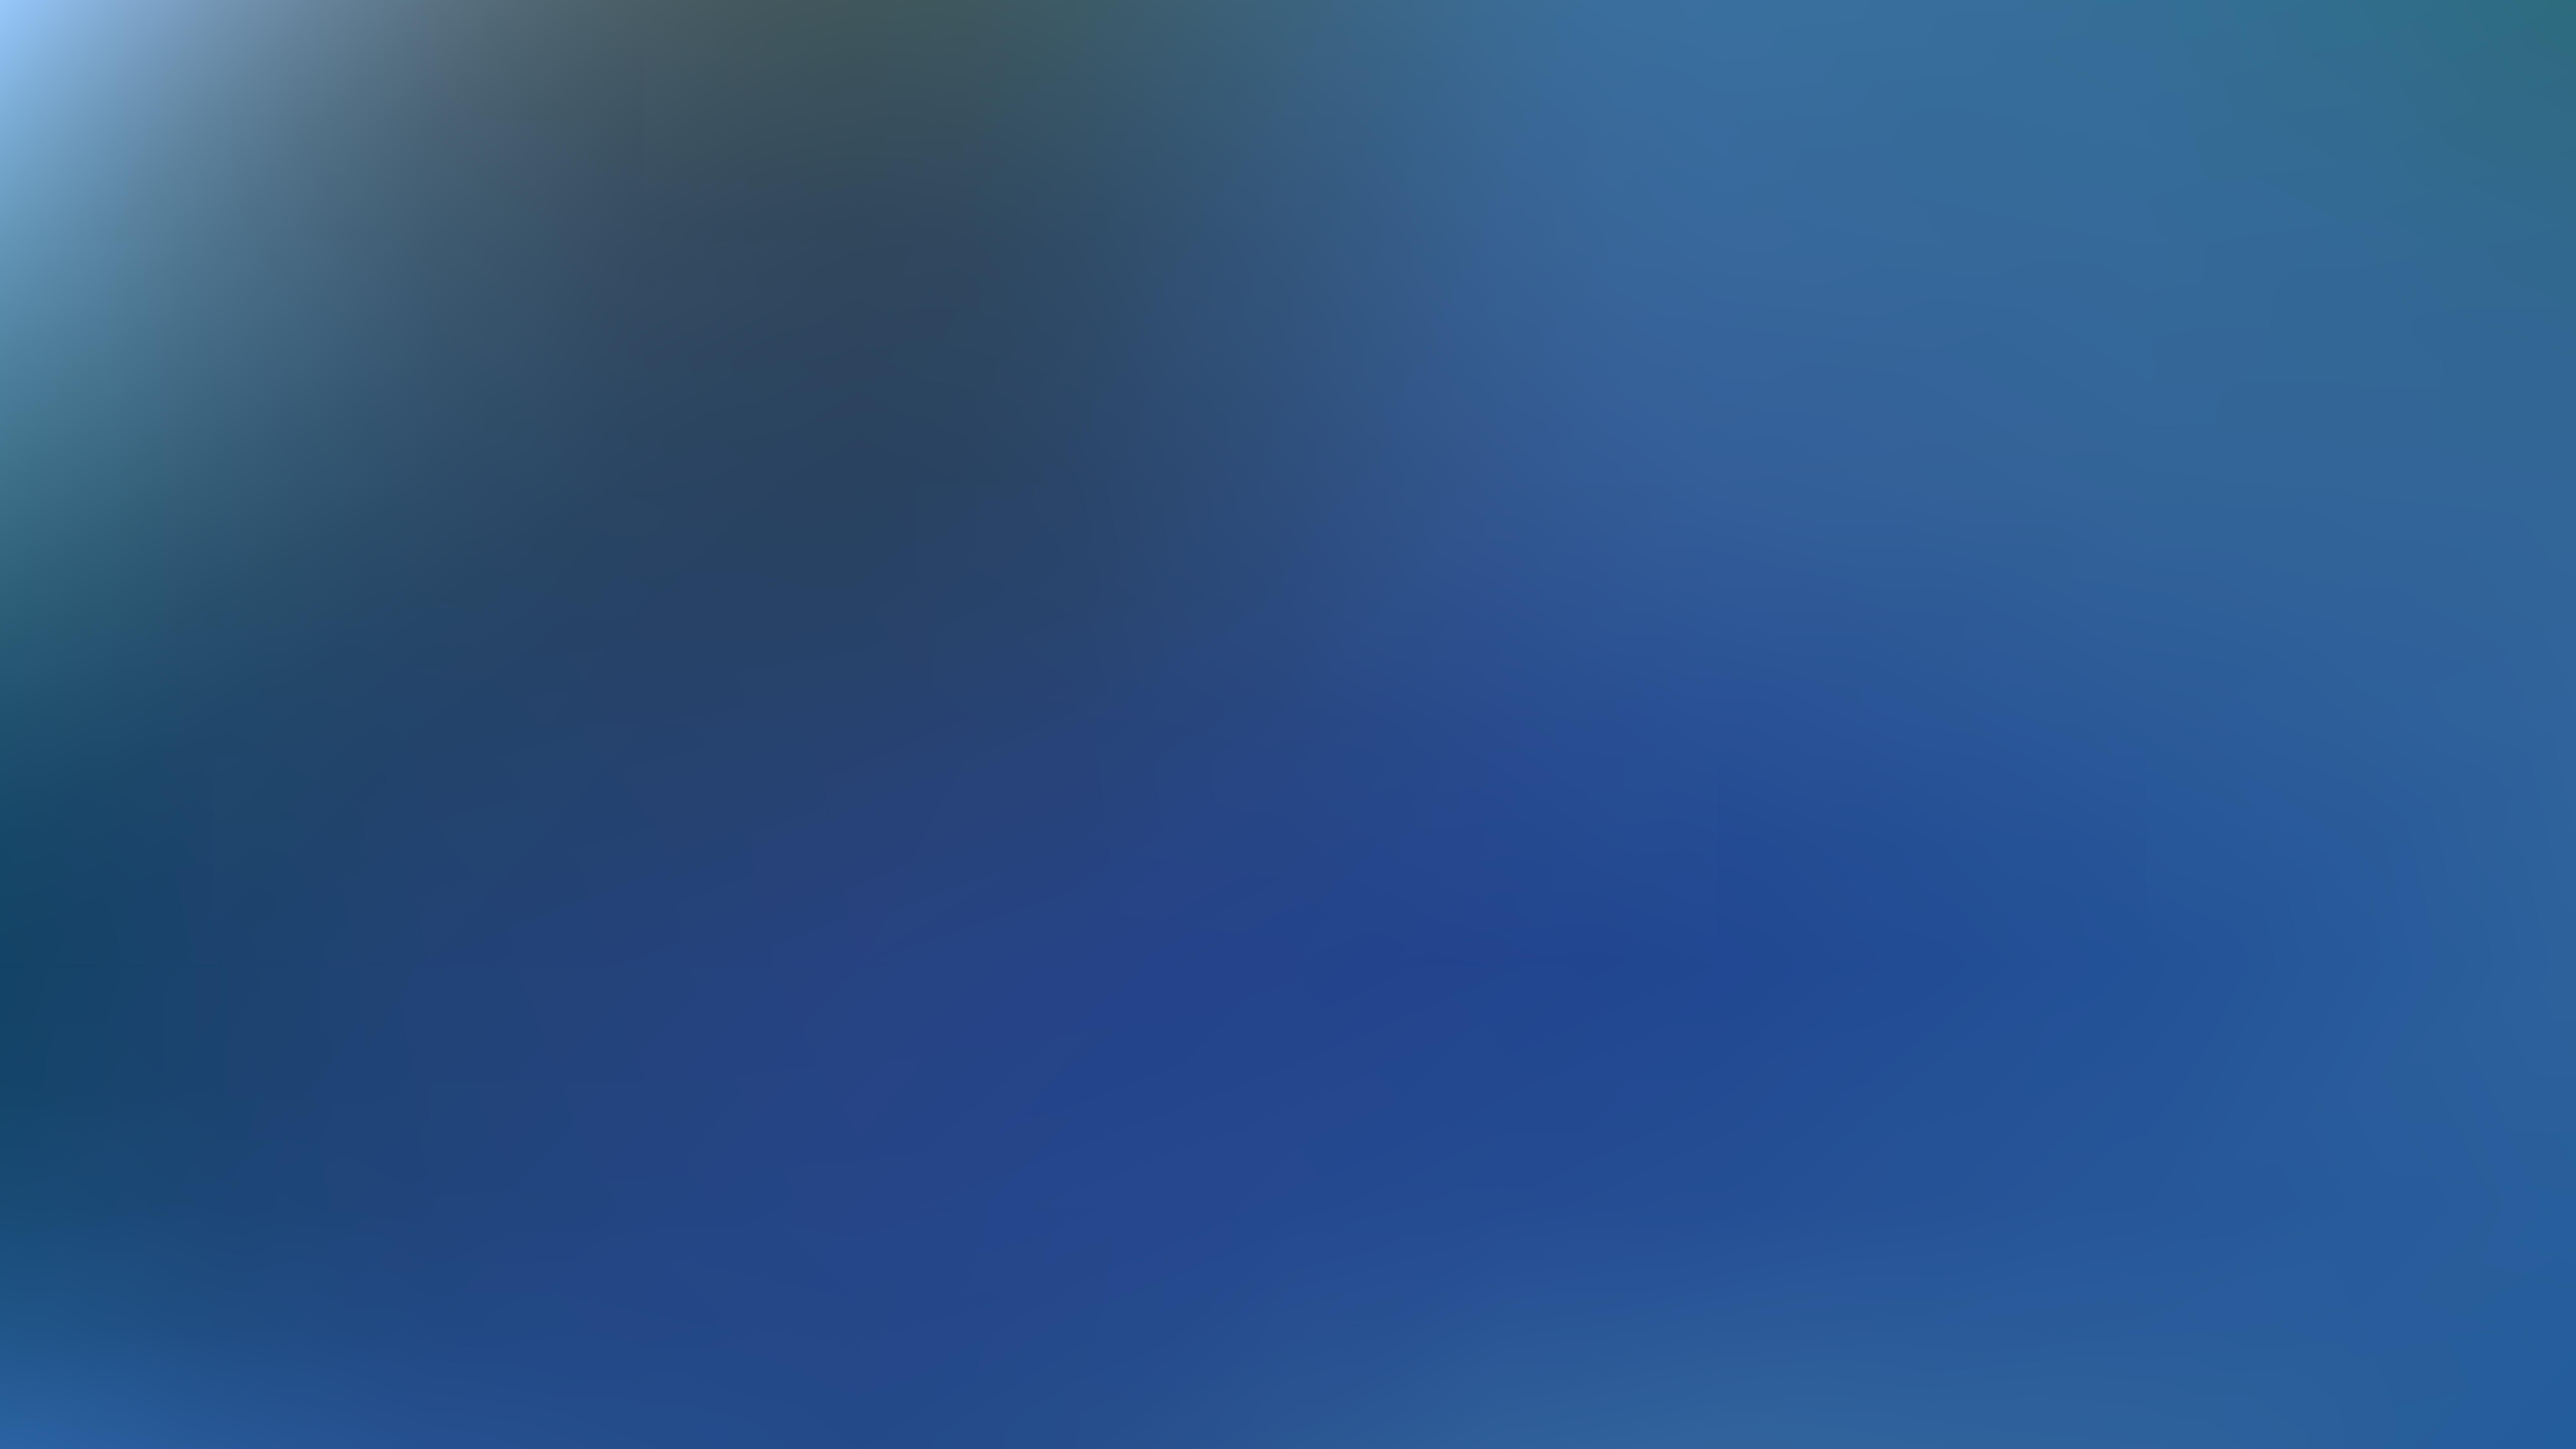 Dark Blue Professional Background Image